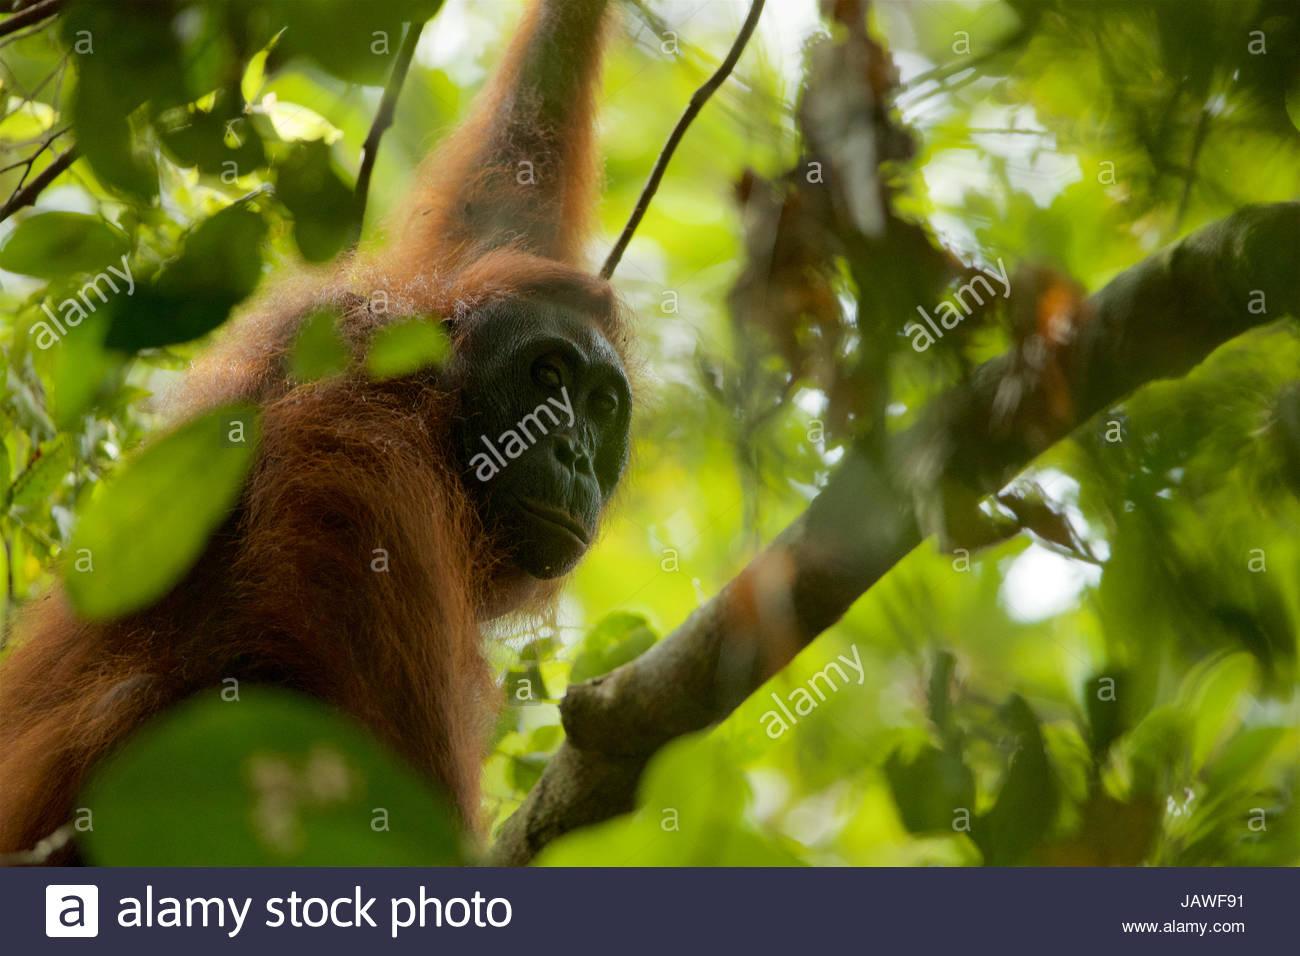 Une femelle orang-outan, Pongo pygmaeus, wurmbii repose dans un arbre à Gunung Palung National Park. Photo Stock